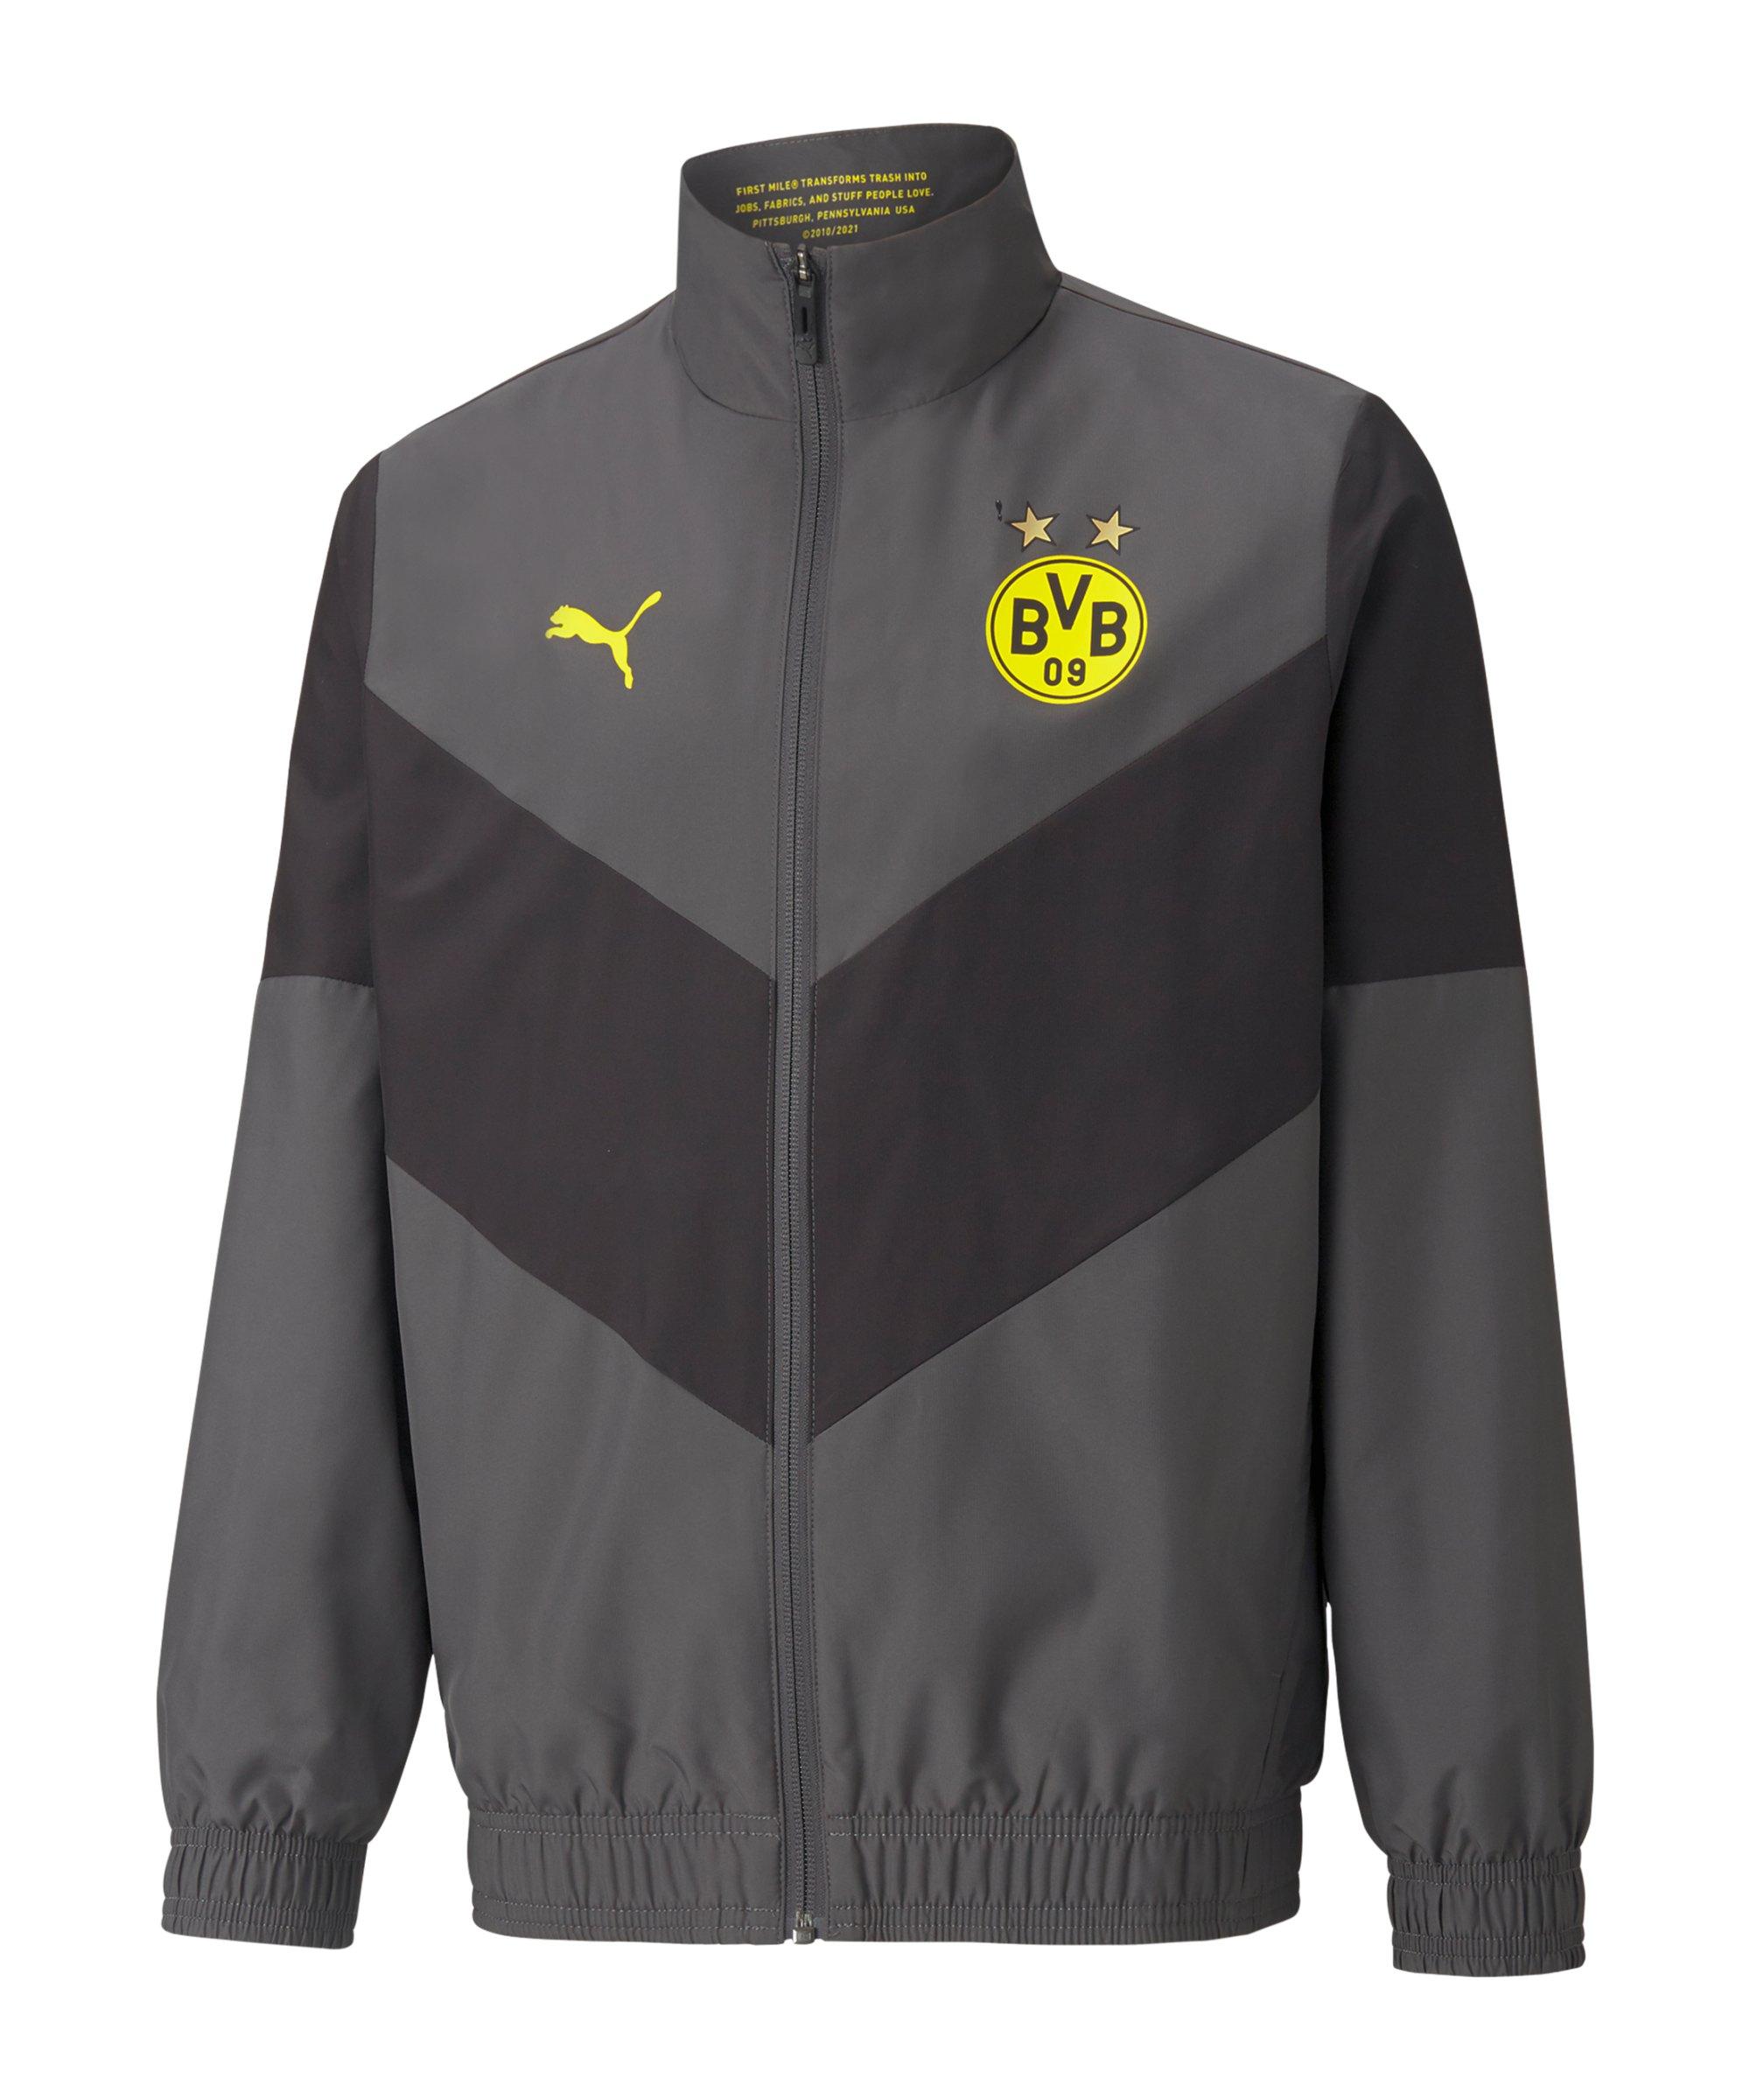 PUMA BVB Dortmund Prematch Jacke Kids 2021/2022 Grau F04 - grau